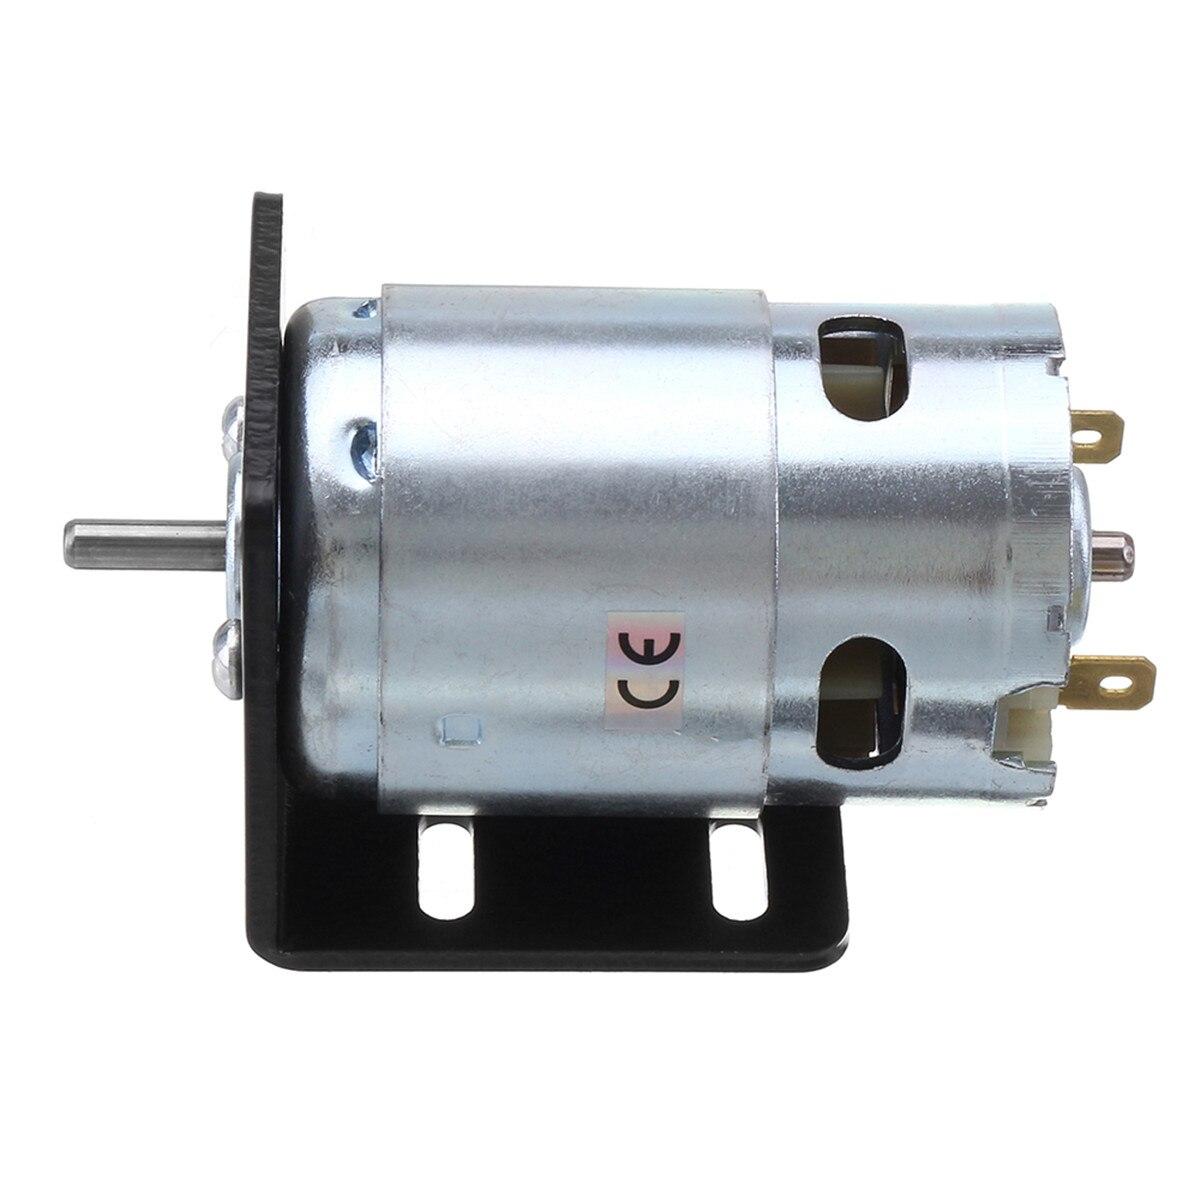 775 795 895 Motor Halterung/Getriebe Motor DC 12 V-24 V 3000-12000RPM Motor Große drehmoment Getriebe Motor